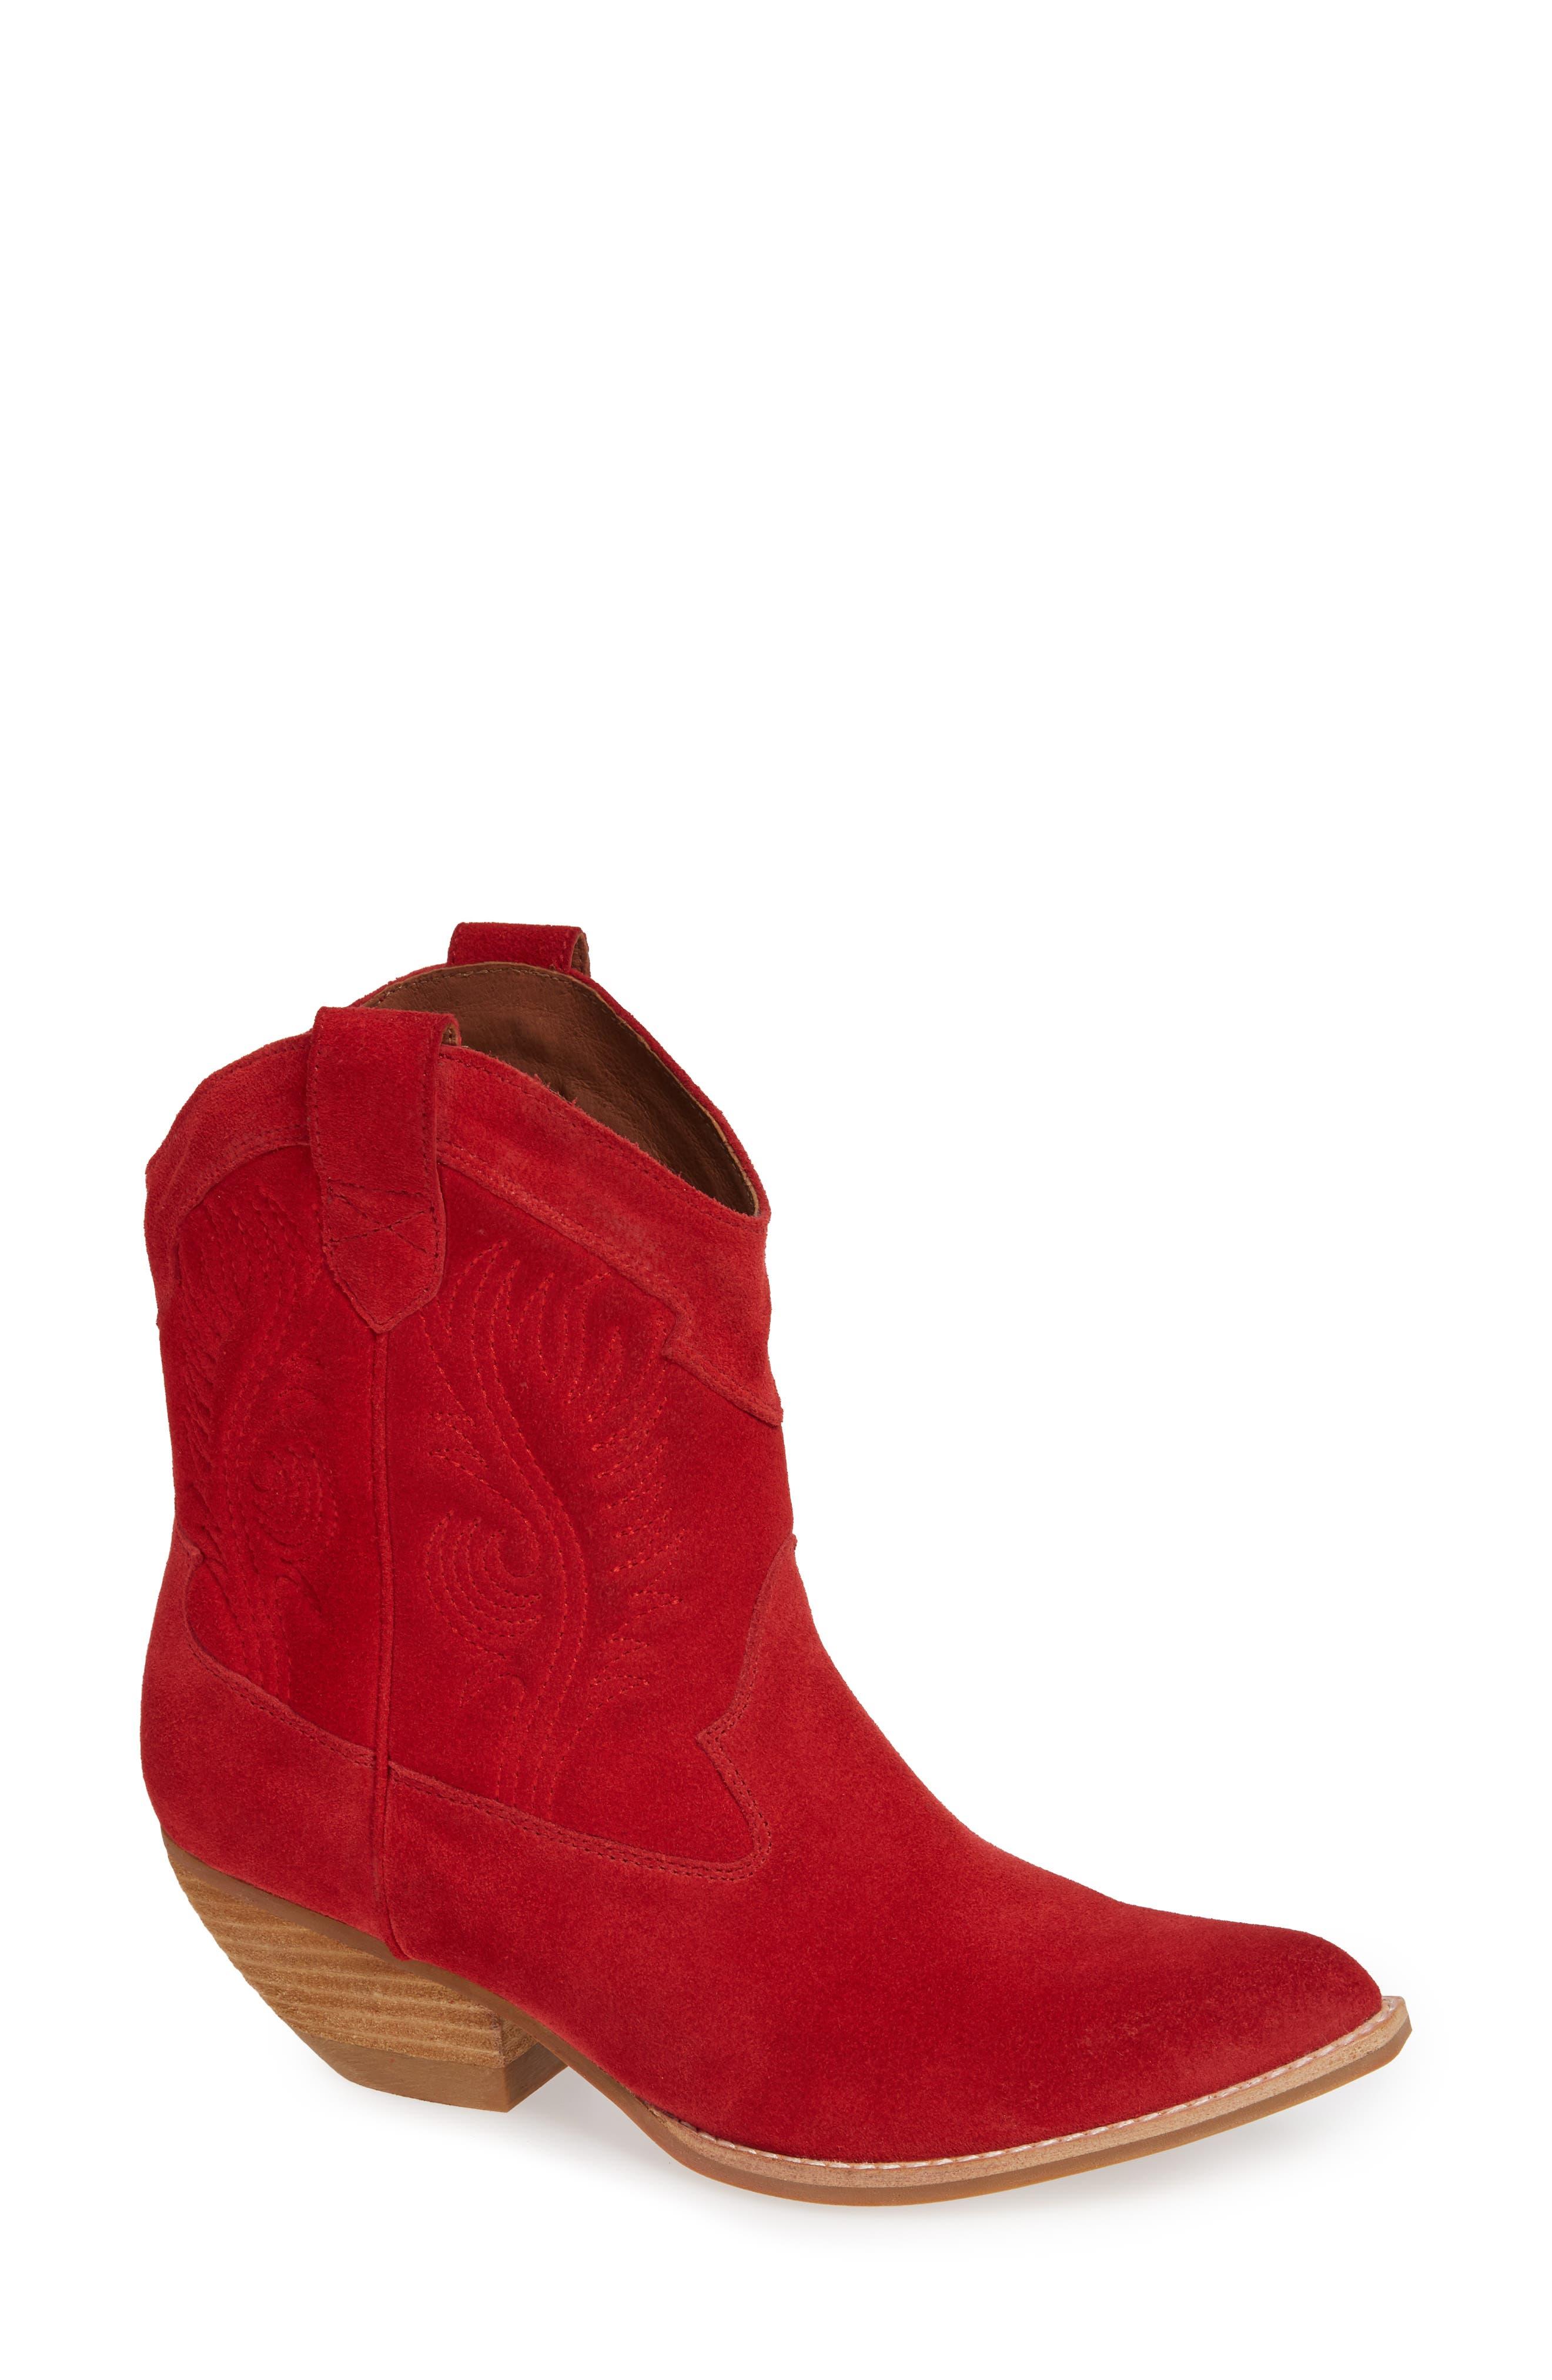 Calvera Western Boot, Main, color, 600